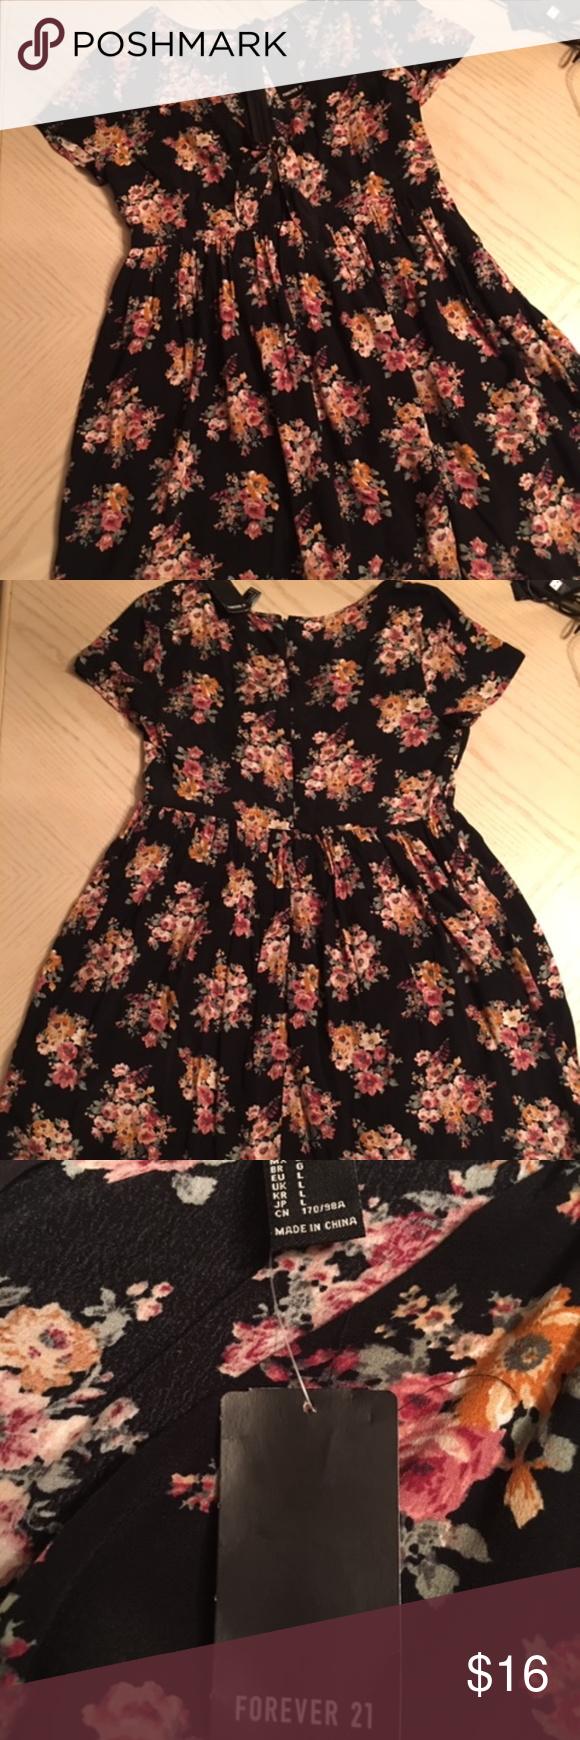 Forever 21 Black Floral Dress Size Large Nwt Floral Dress Black Dresses Large Size Dresses [ 1740 x 580 Pixel ]